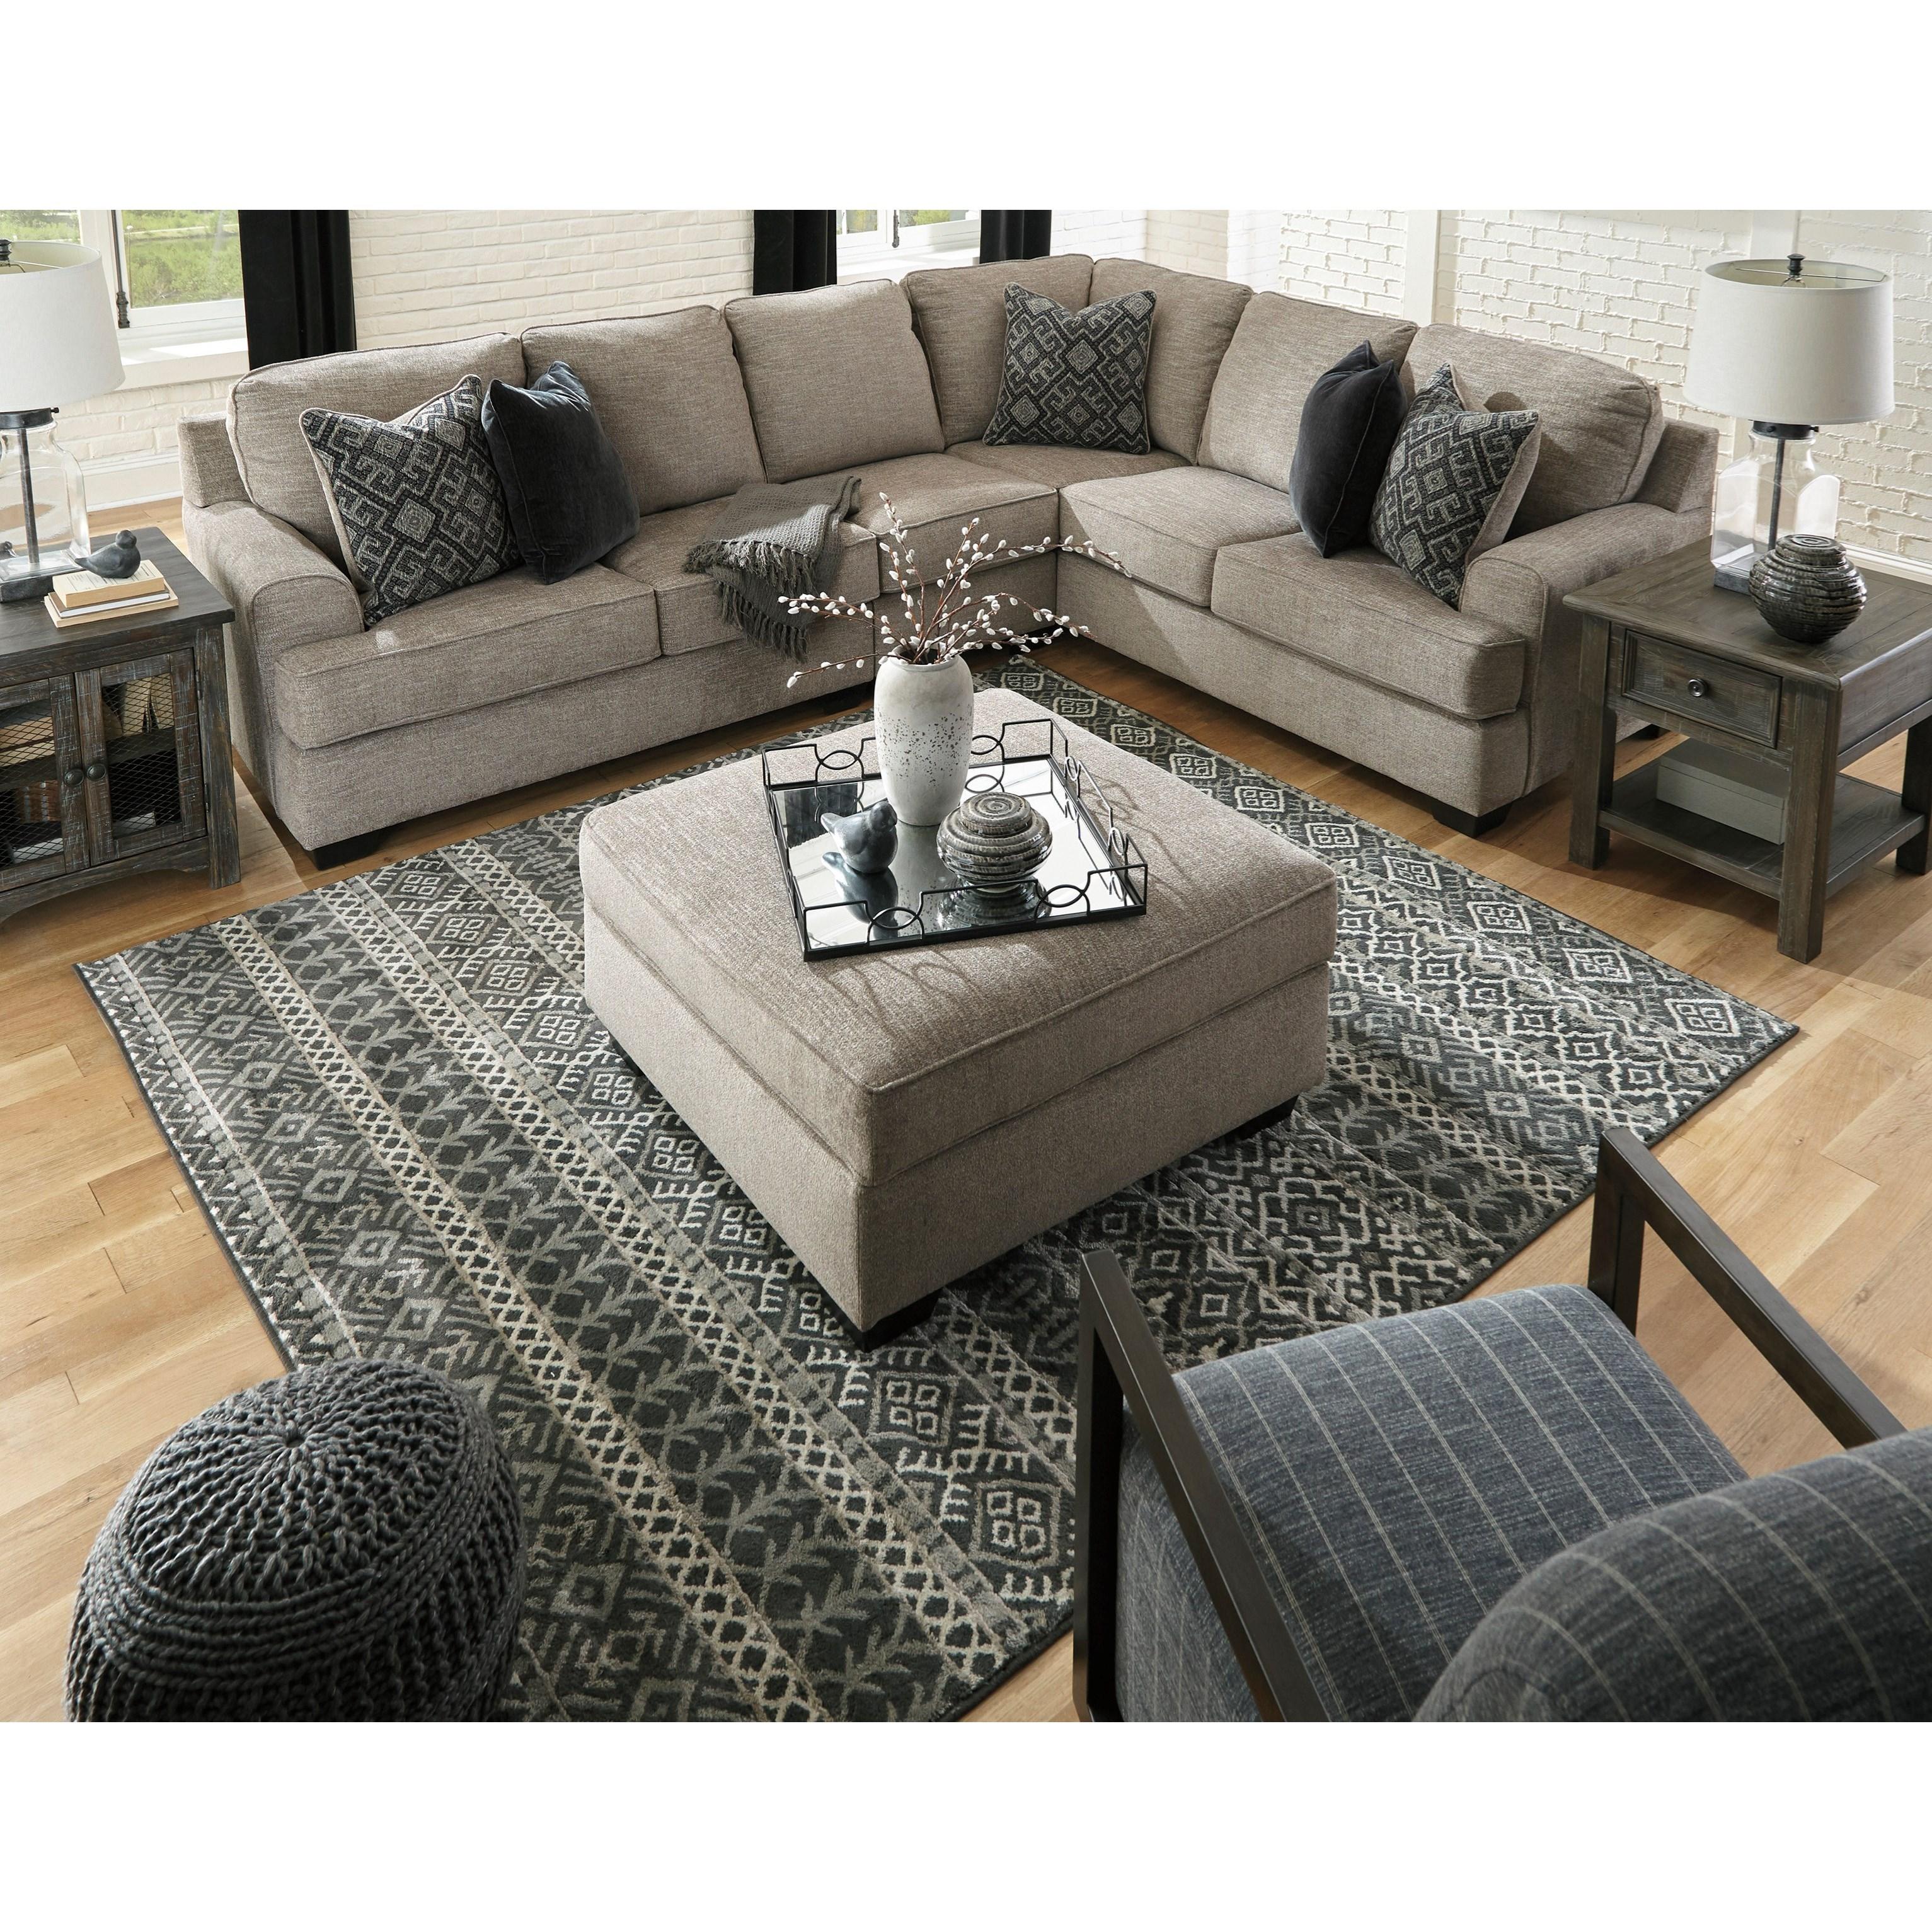 Ashley Furniture Signature: Ashley Signature Design Bovarian Storage Ottoman